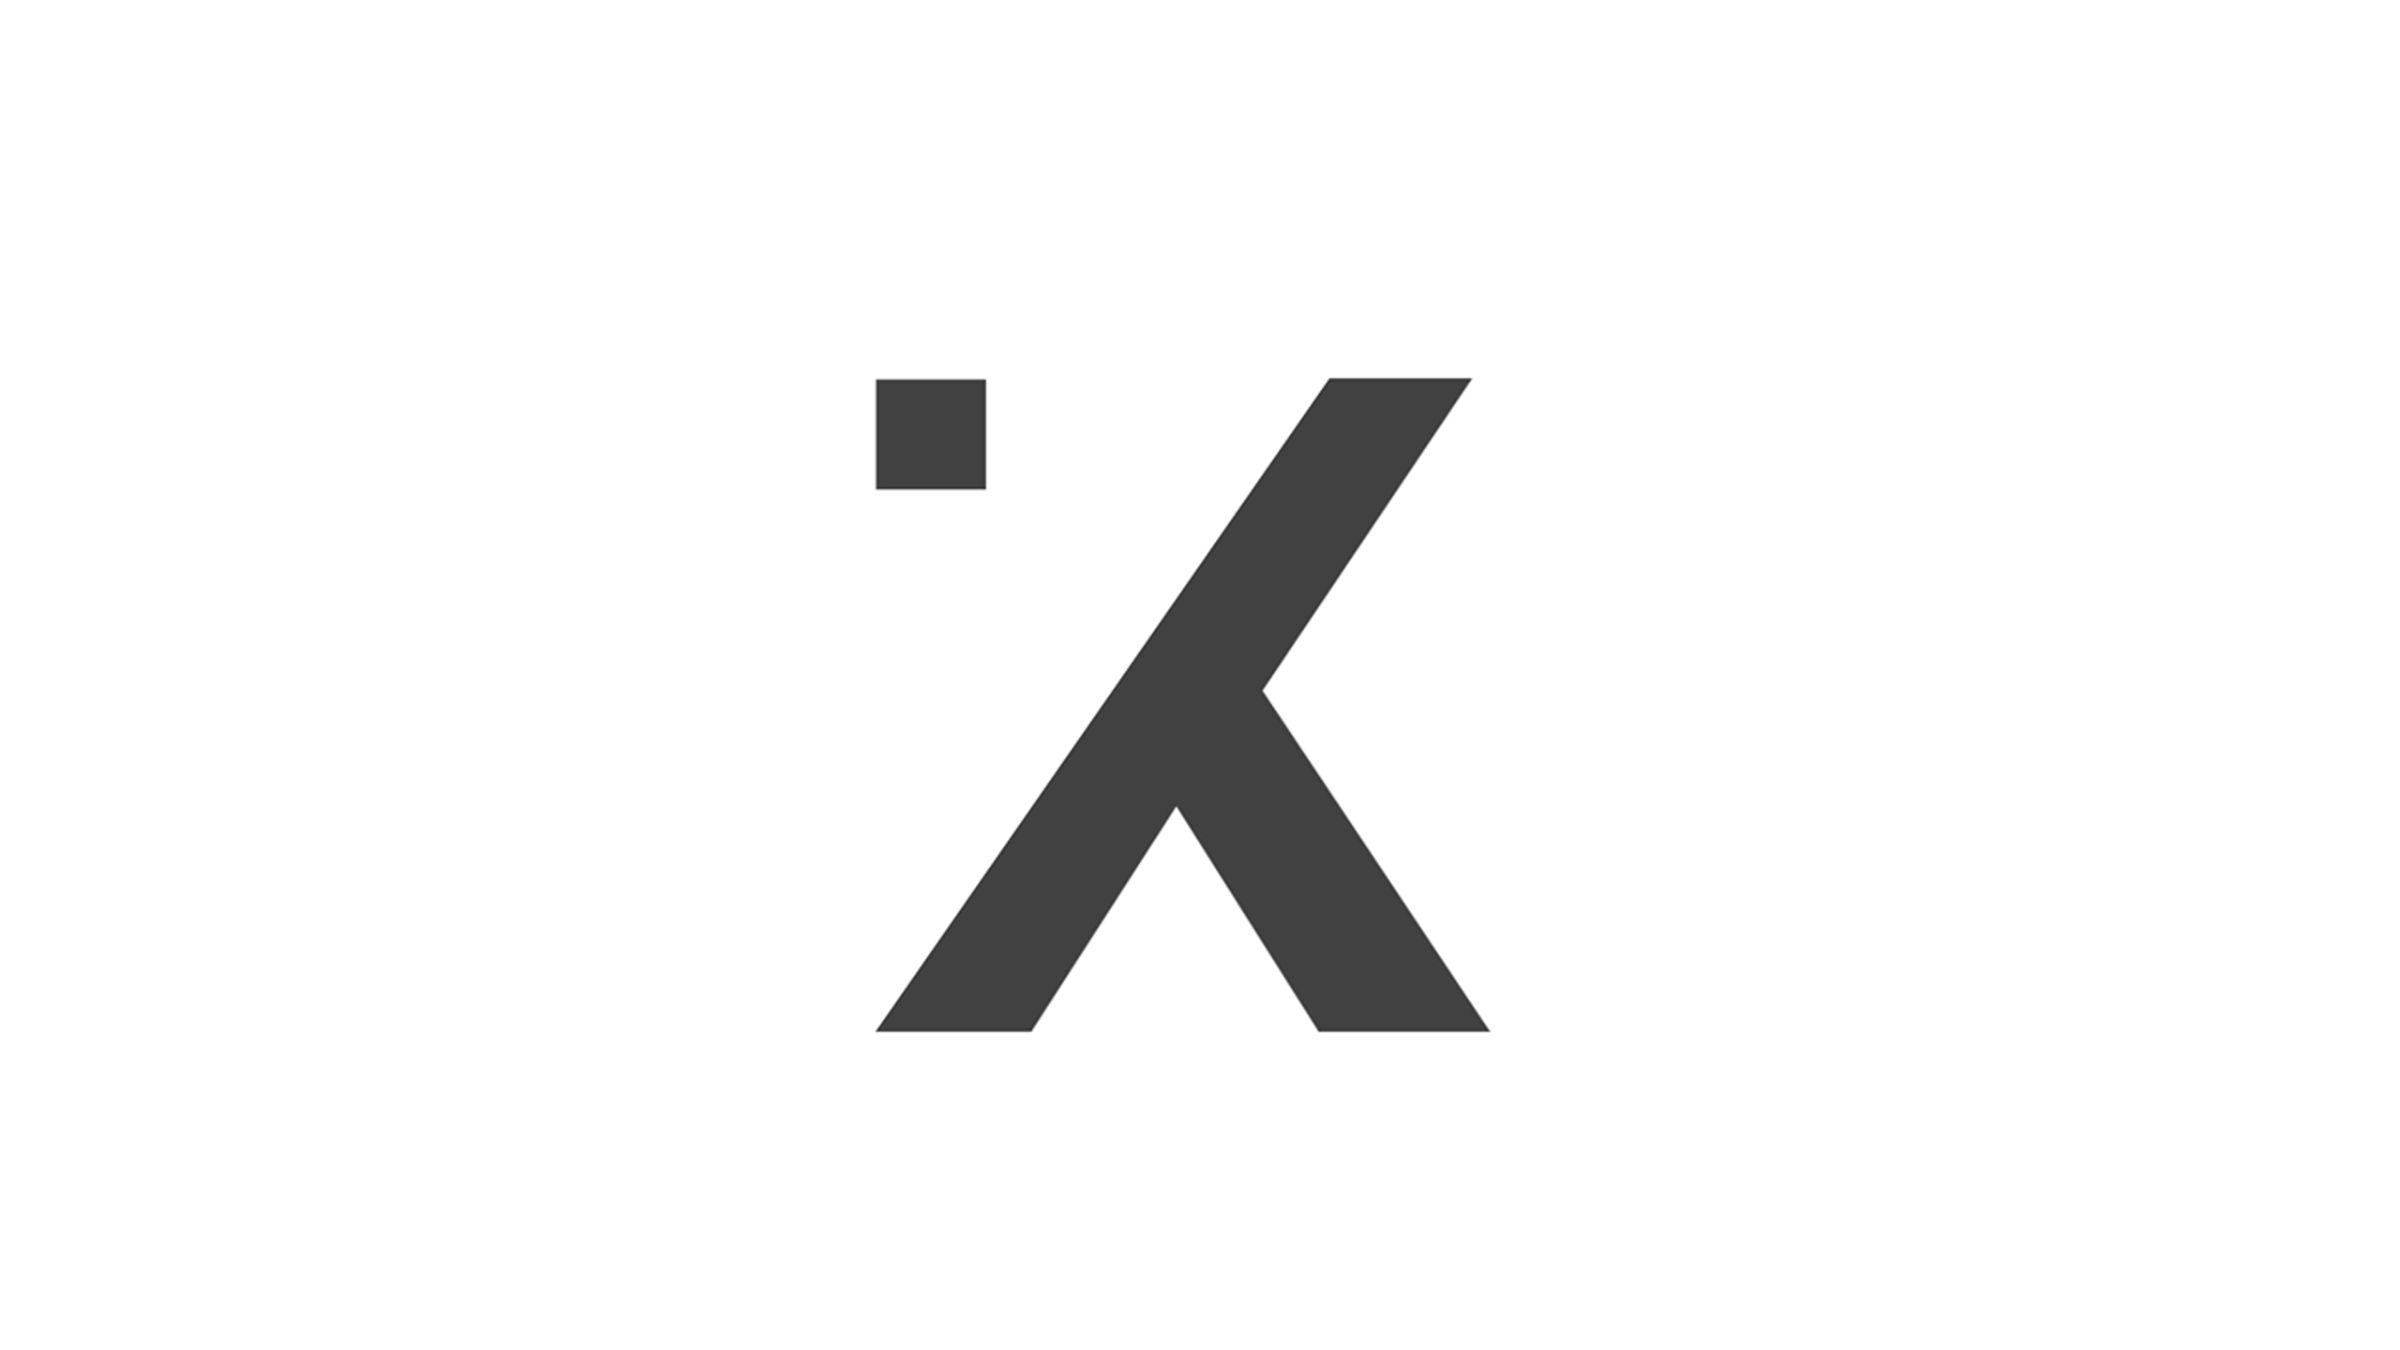 koalicja-logo.jpg